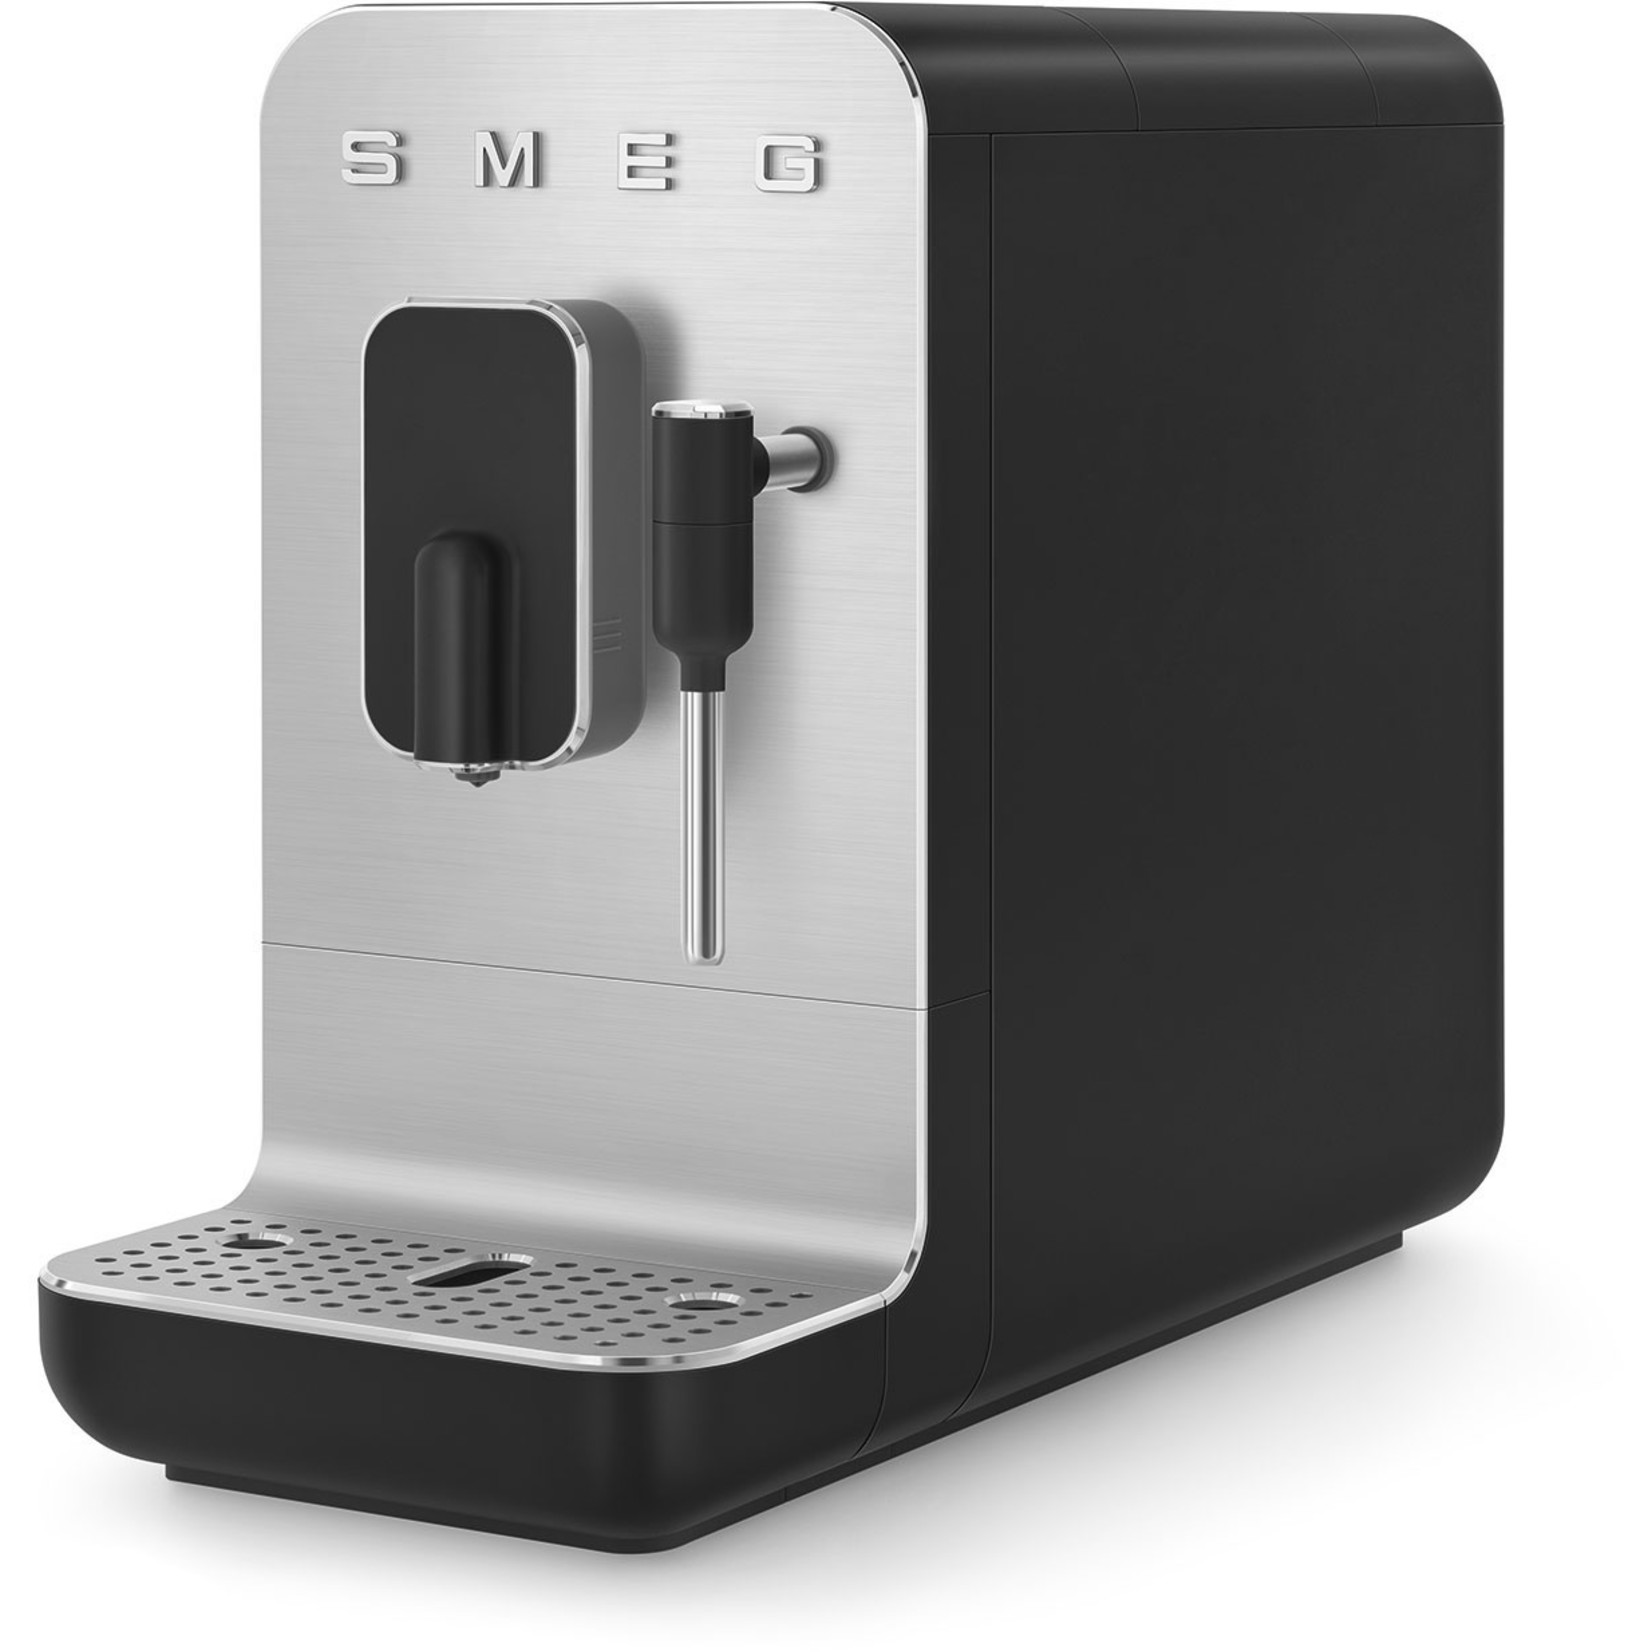 Smeg Smeg espressomachine medium, mat zwart, met stoomfunctie